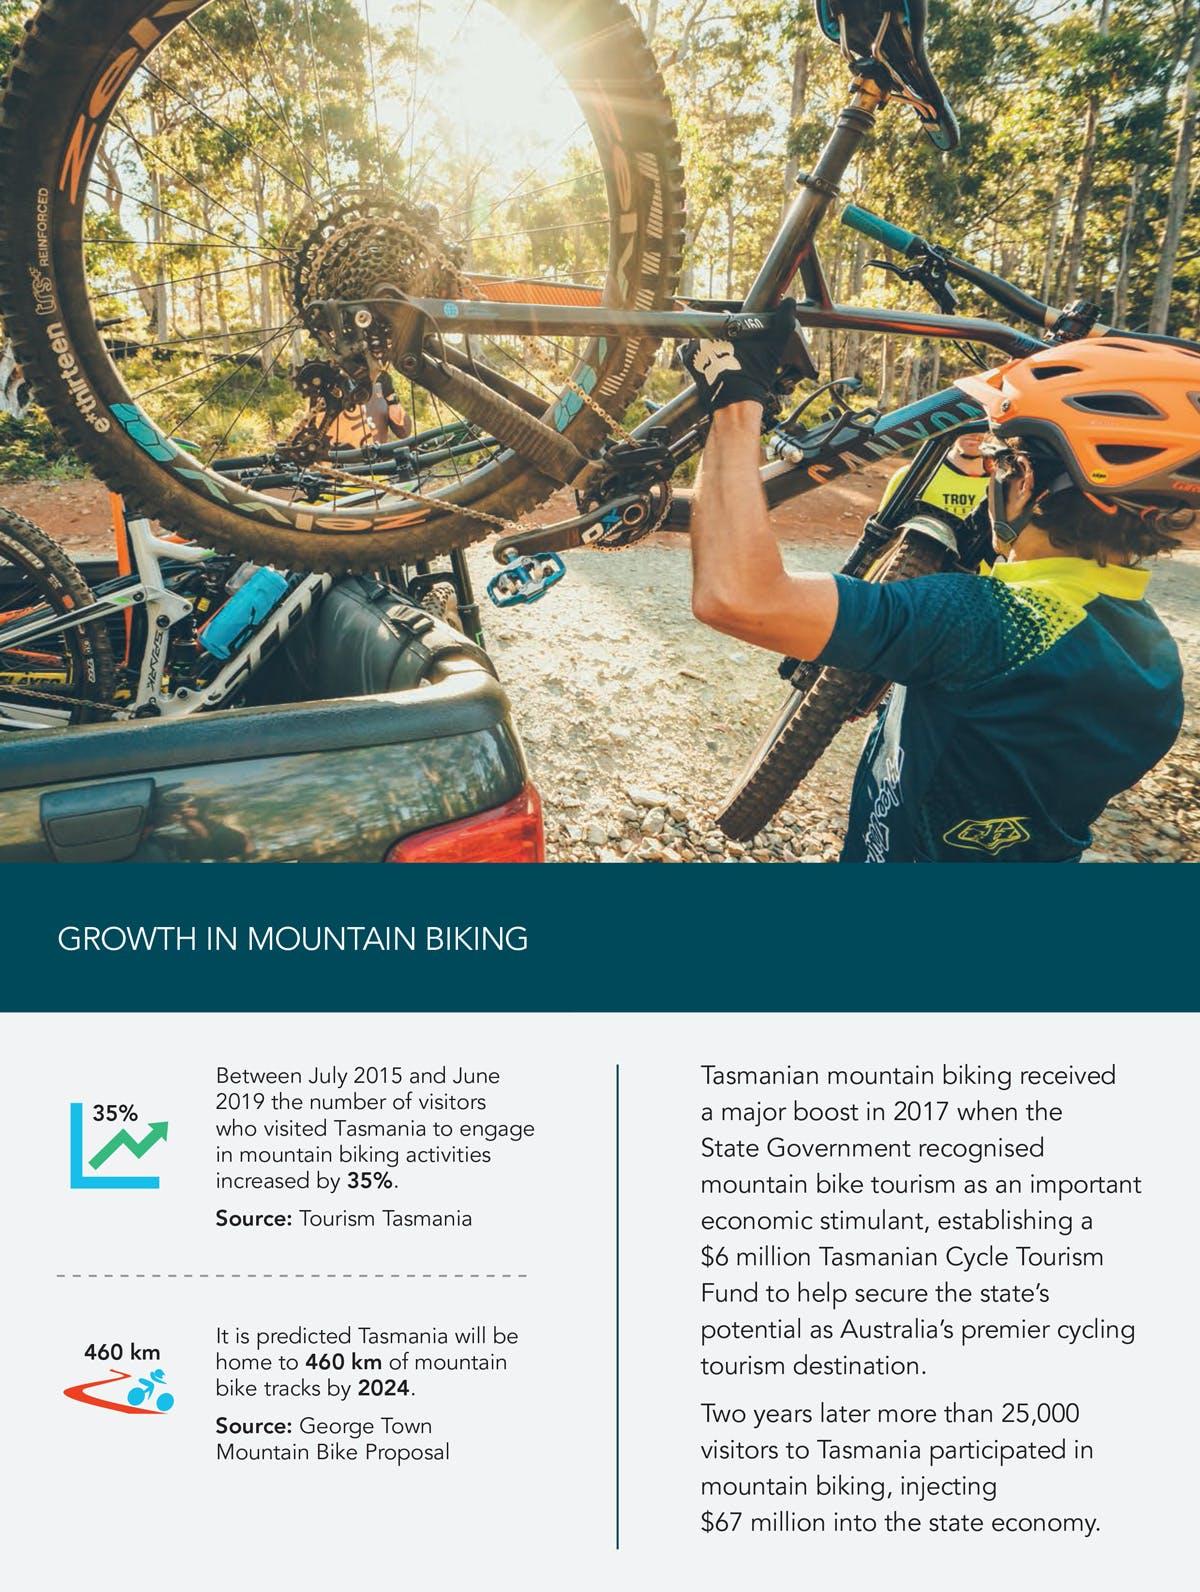 Riding-the-Mountain-Growth-in-Mountain-Biking.jpg